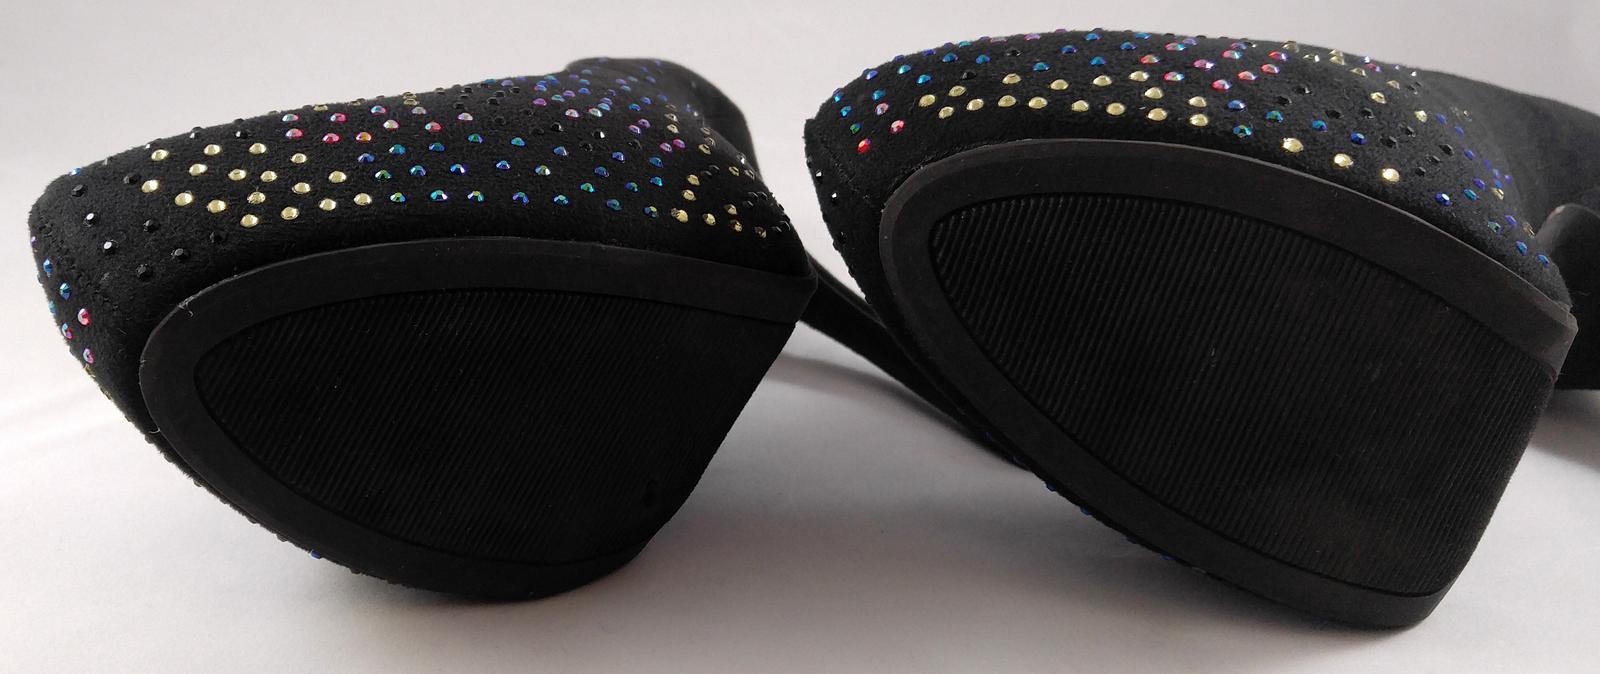 Women's Brash Jeweled Black Vegan Suede Stiletto Heels Pumps Shoes Size 9 ½